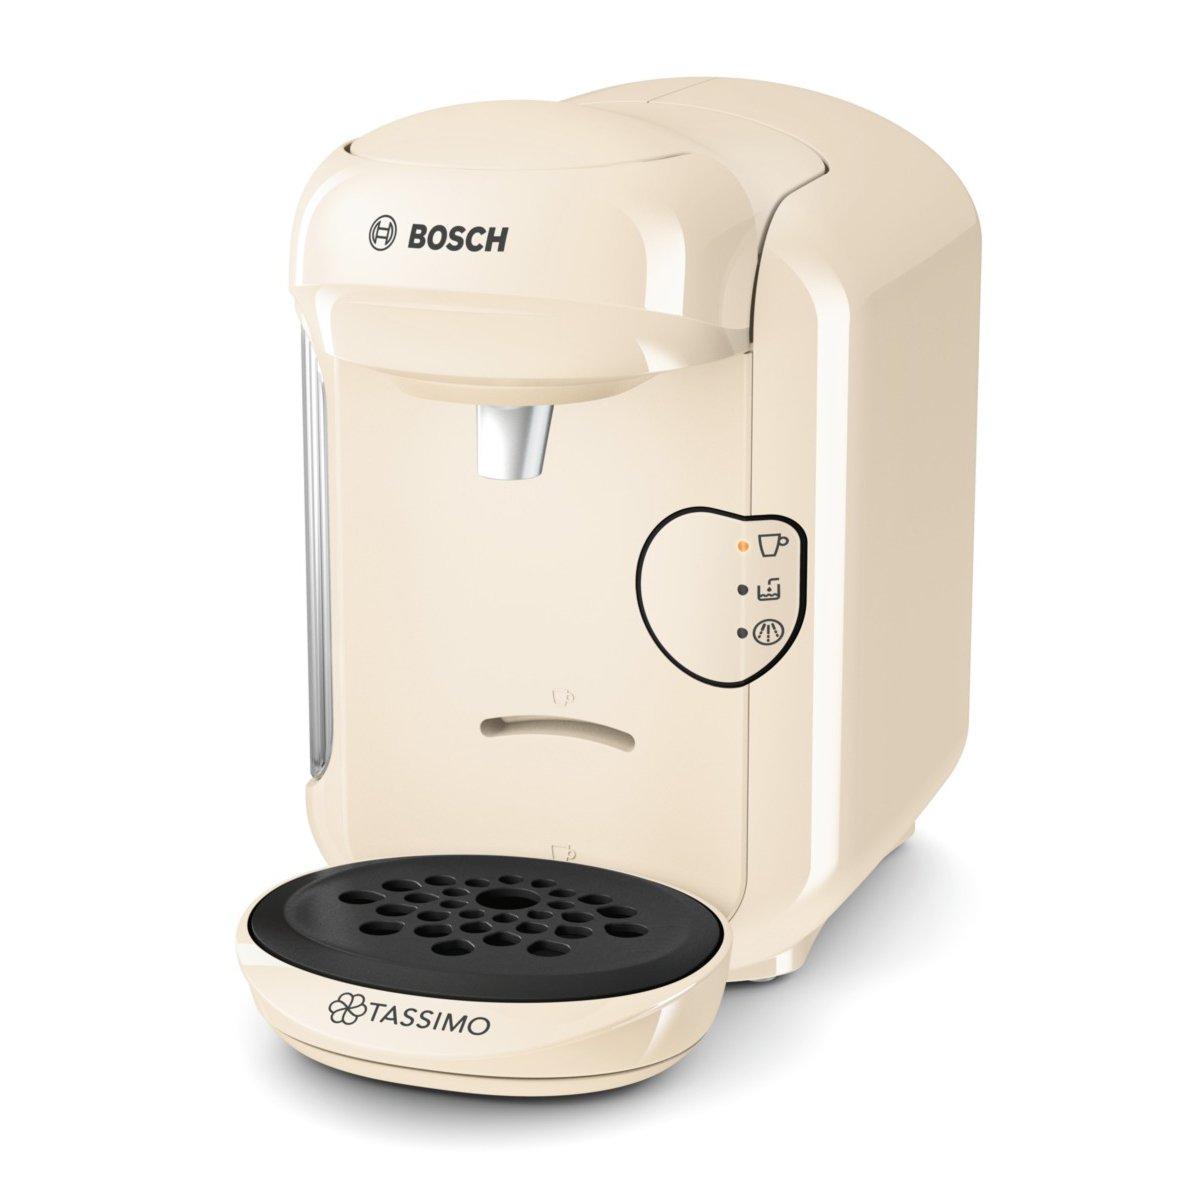 Kleine kaffeemaschine, Bosch Tassimo Kapselmaschine